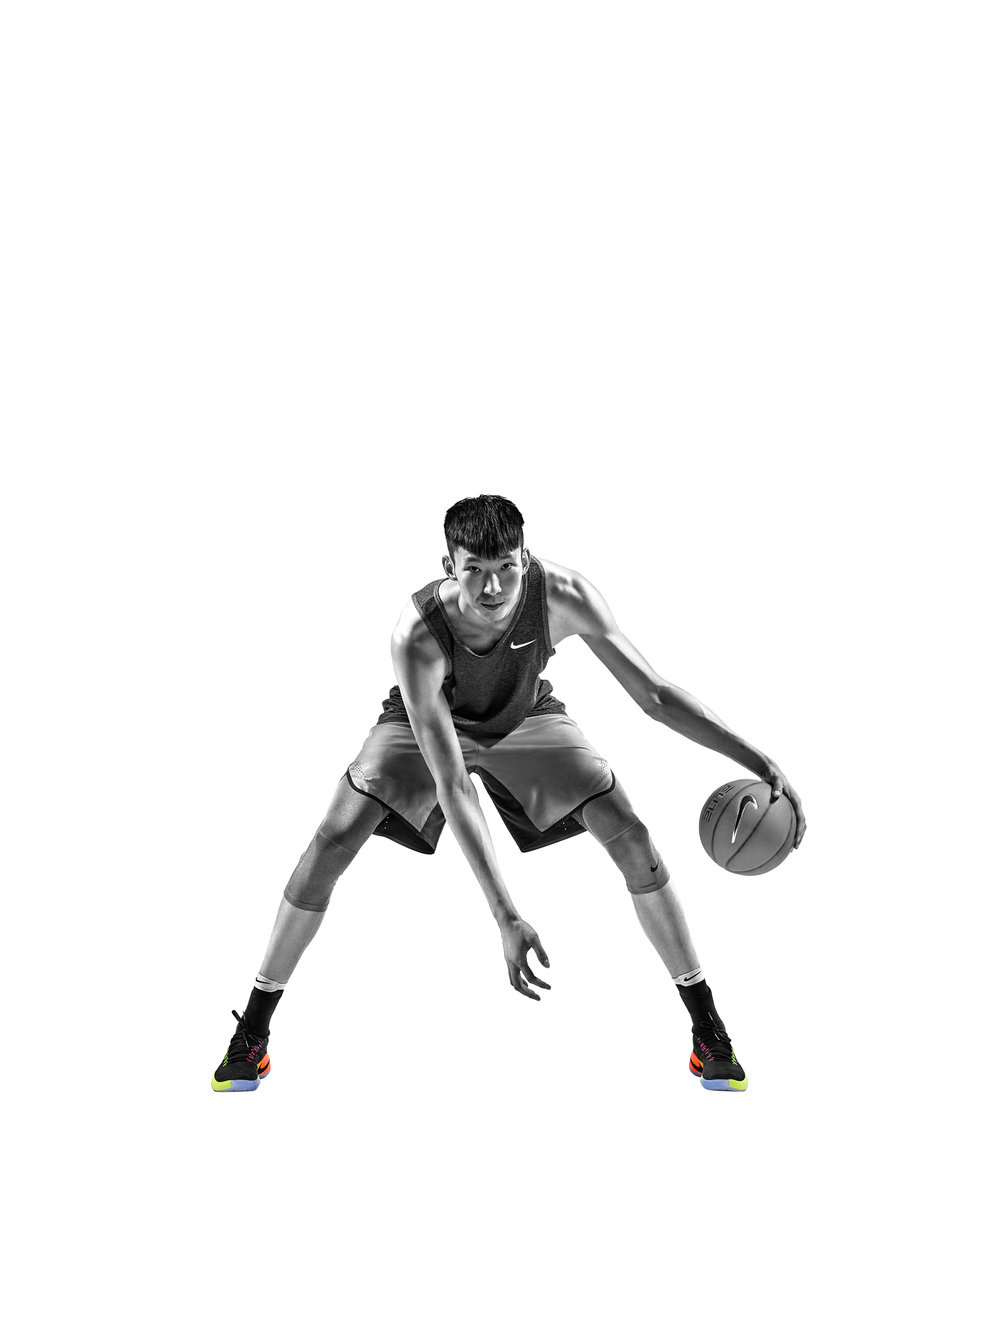 Nike_RIO_042616_0336_v03.jpg